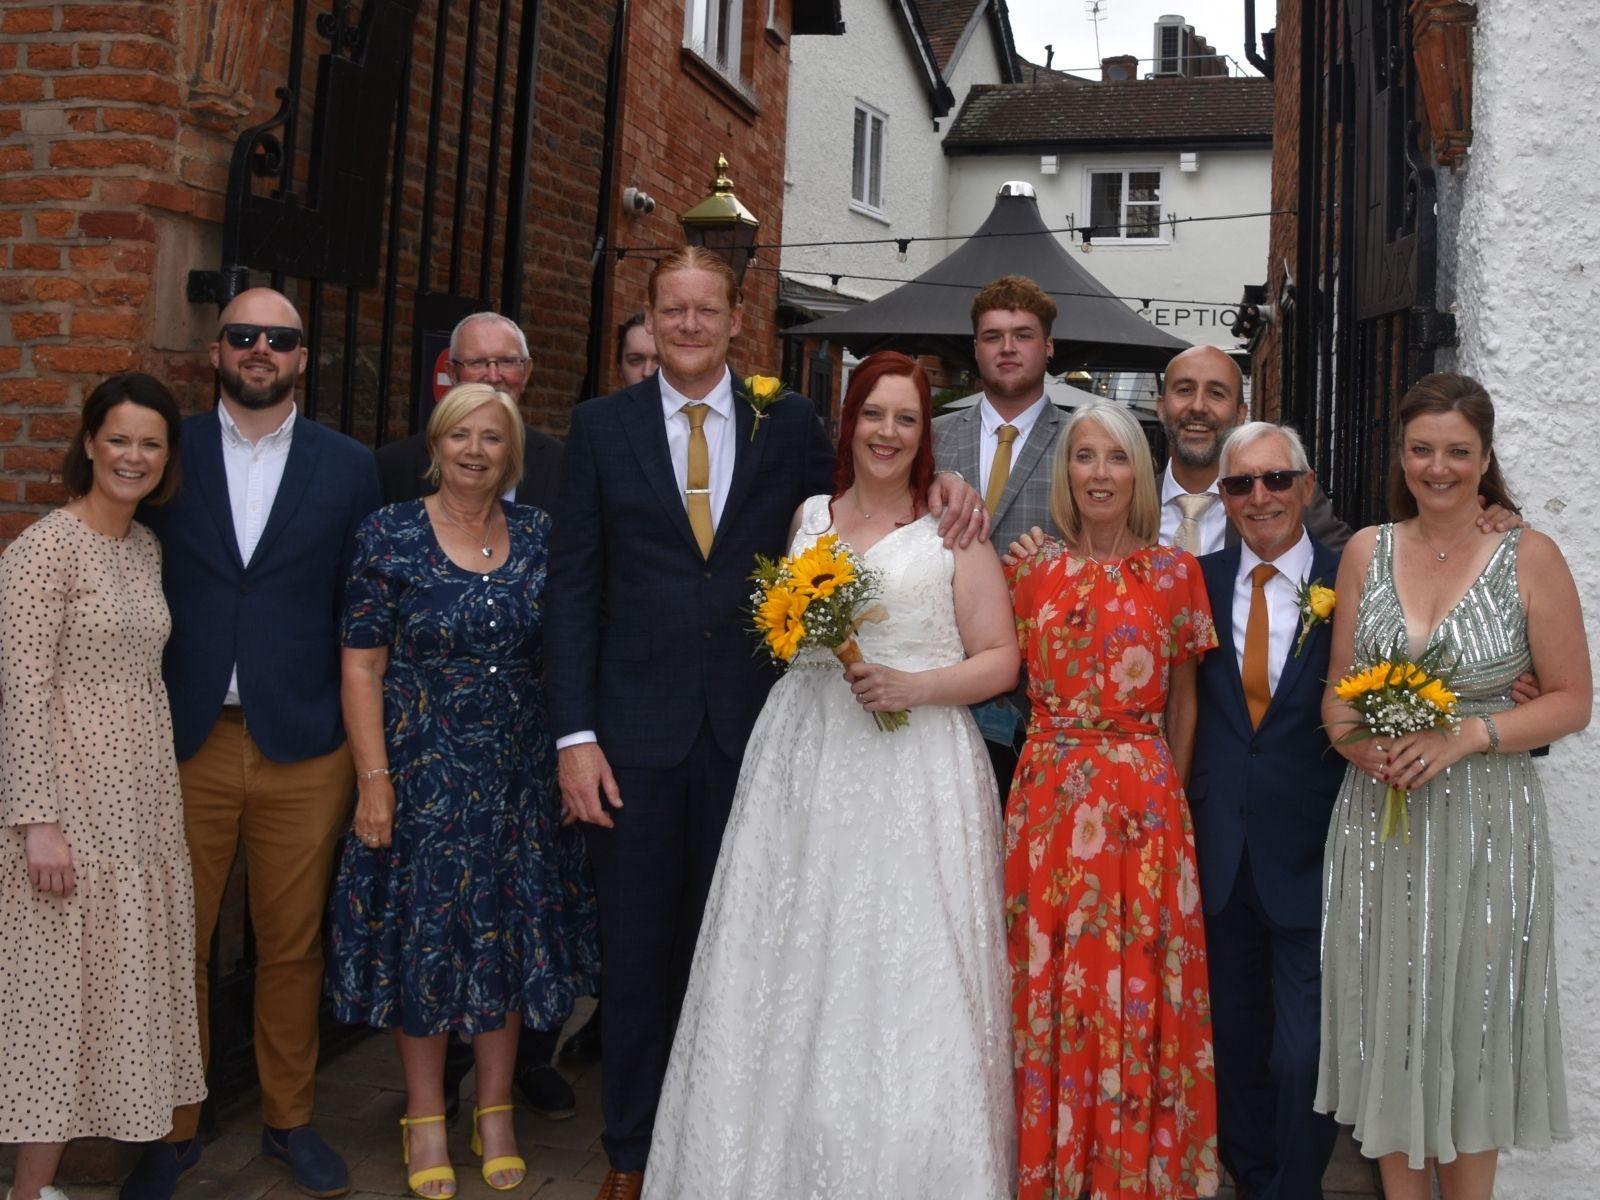 Estelle's wedding at the White Swan Hotel, Stratford-Upon-Avon